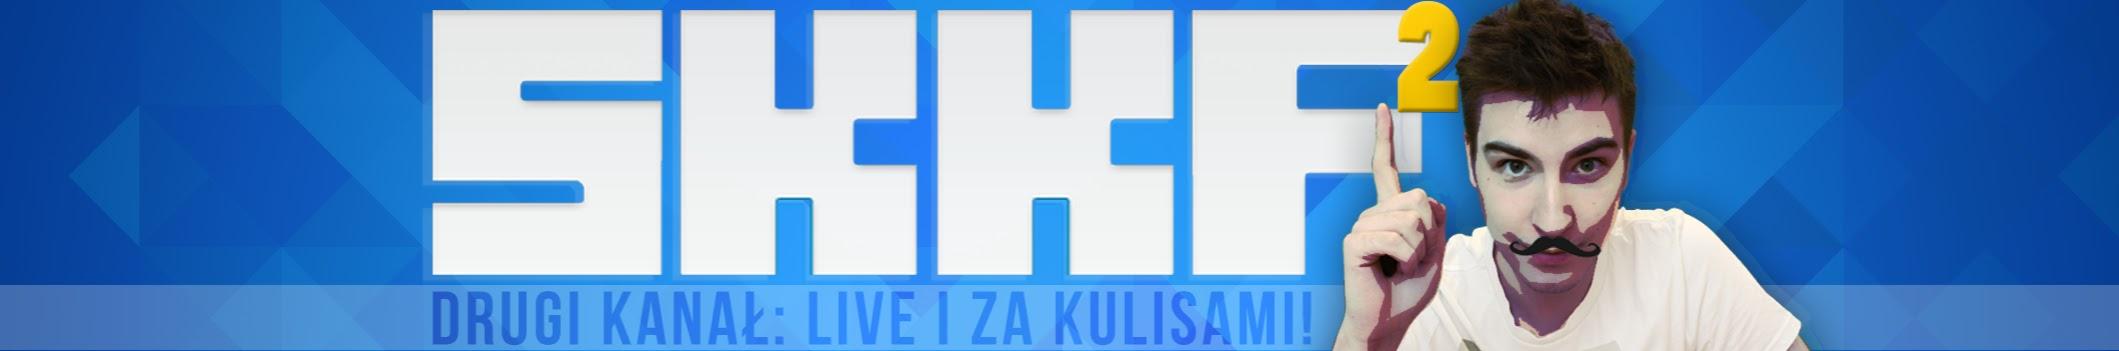 skkf2